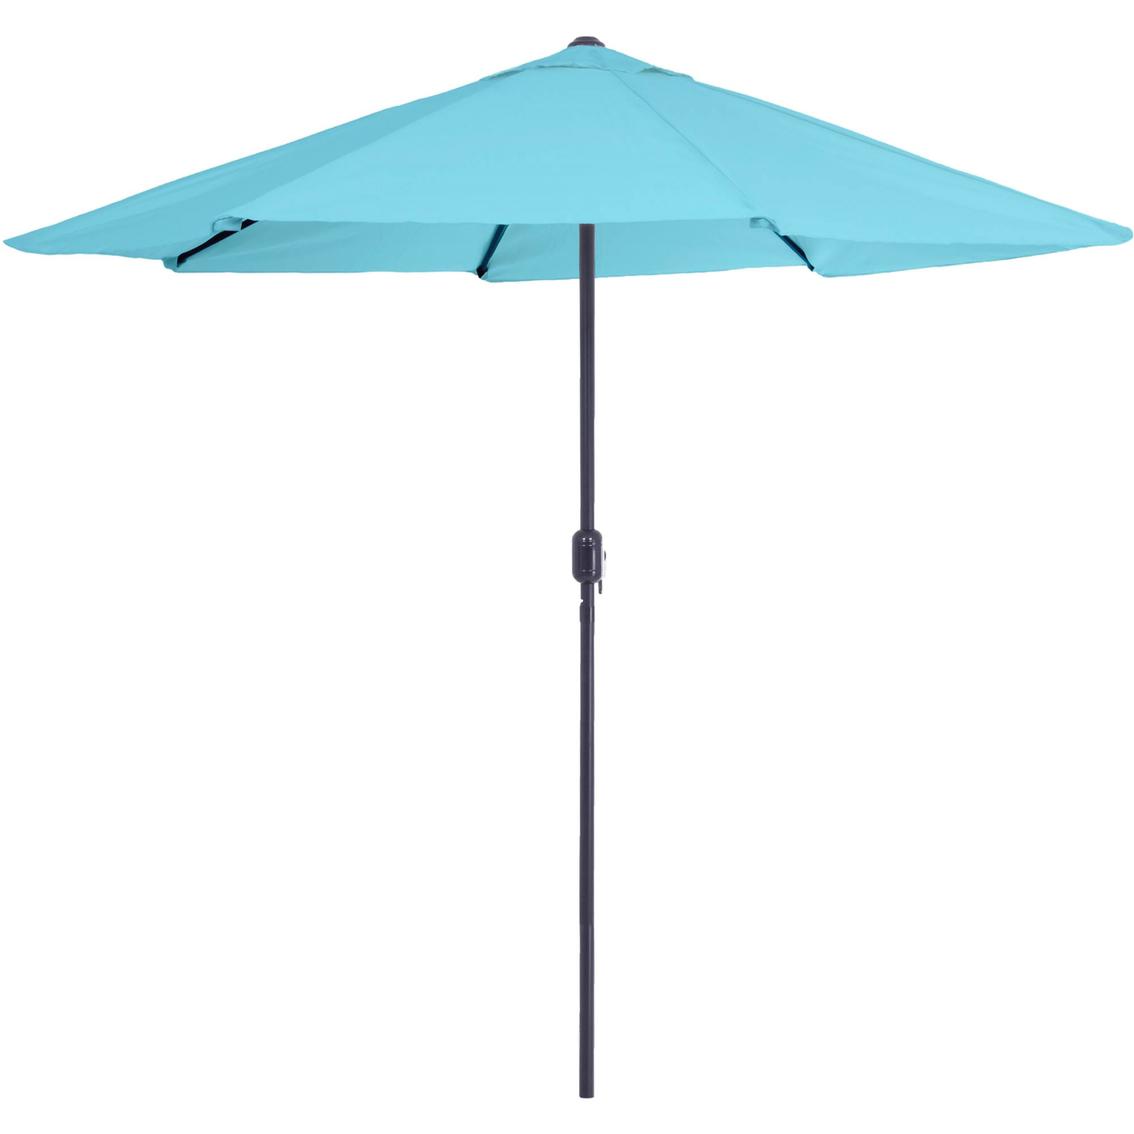 Pure Garden 9 Ft Aluminum Patio Umbrella With Auto Crank Table